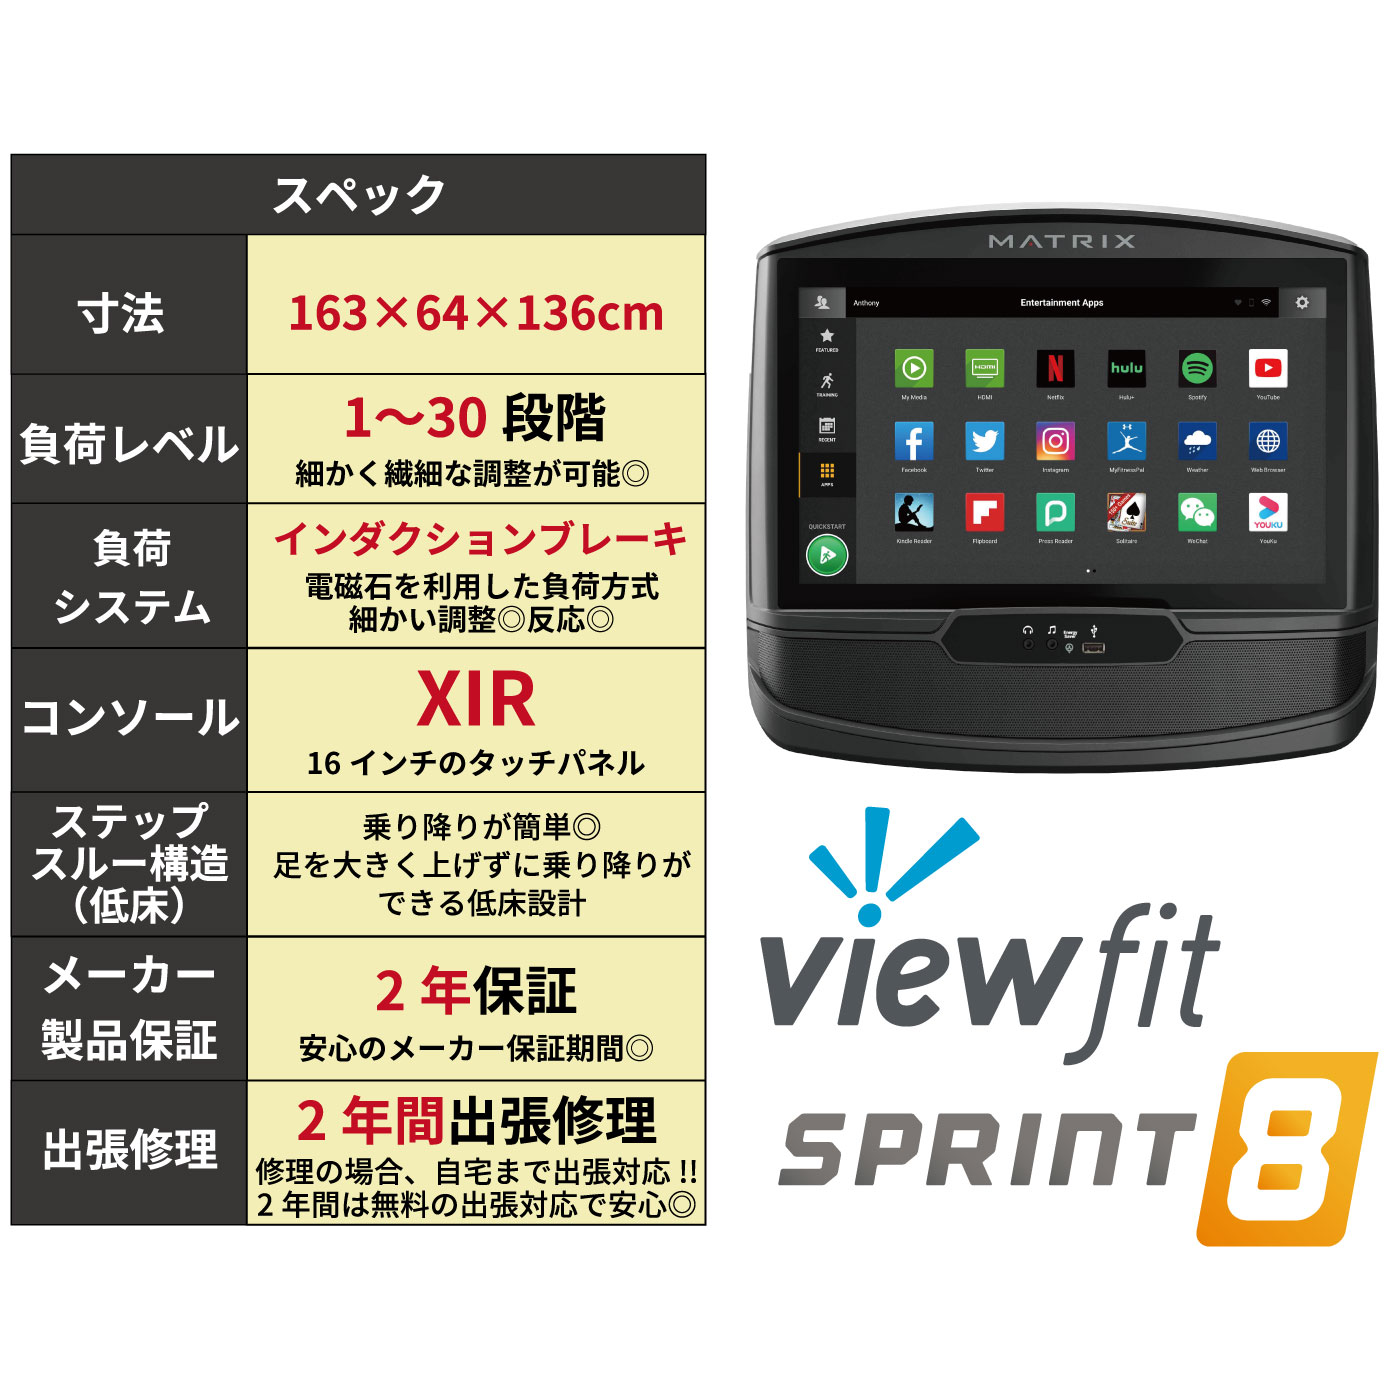 R50-XIR-V2のスペック